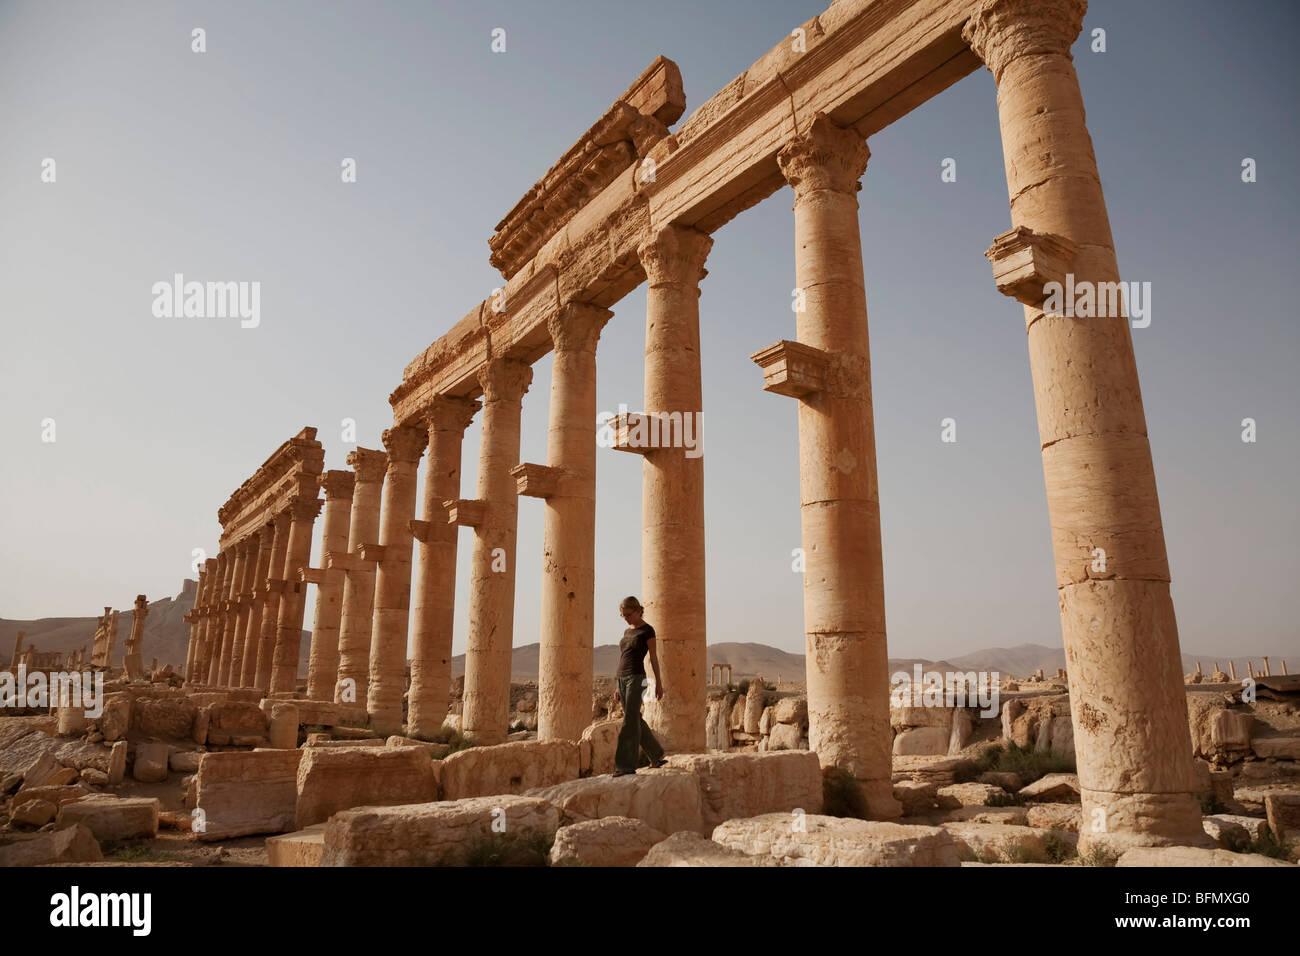 Queen Of Palmyra Stock Photos & Queen Of Palmyra Stock Images - Alamy